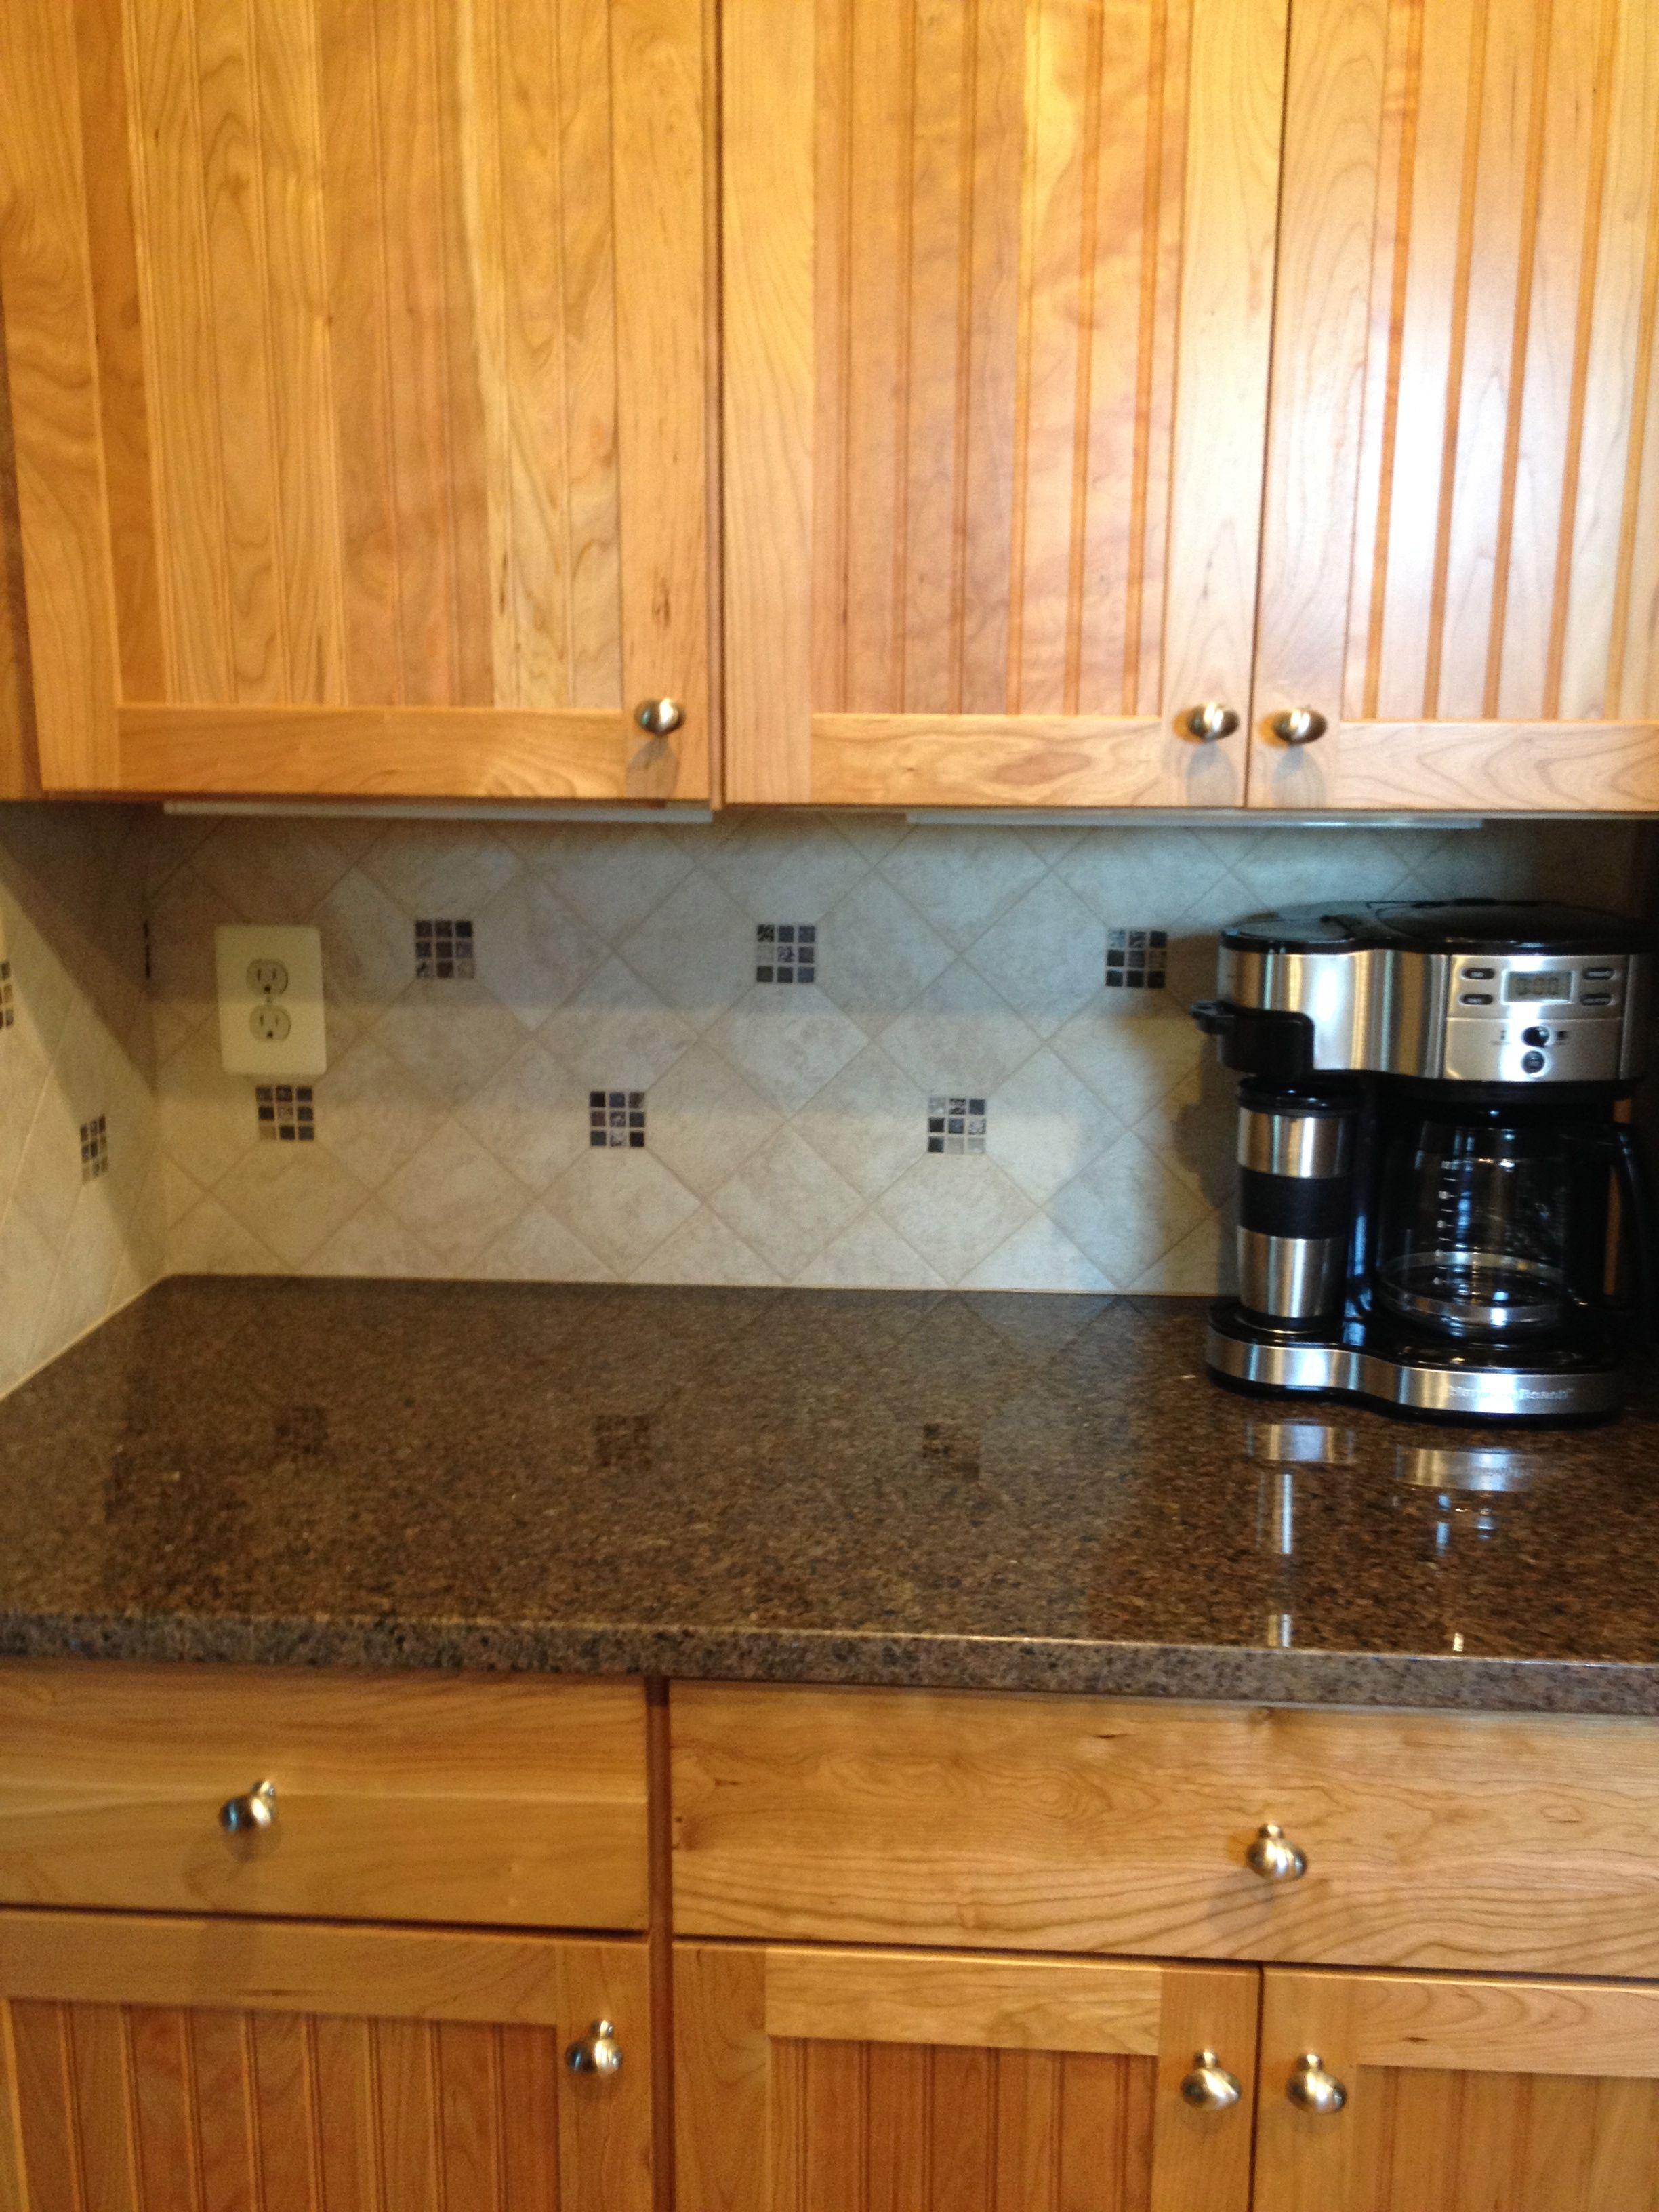 Kitchen Remodel Granite Countertops Kitchen Remodel Maroon Costar Granite Countertop With Tile